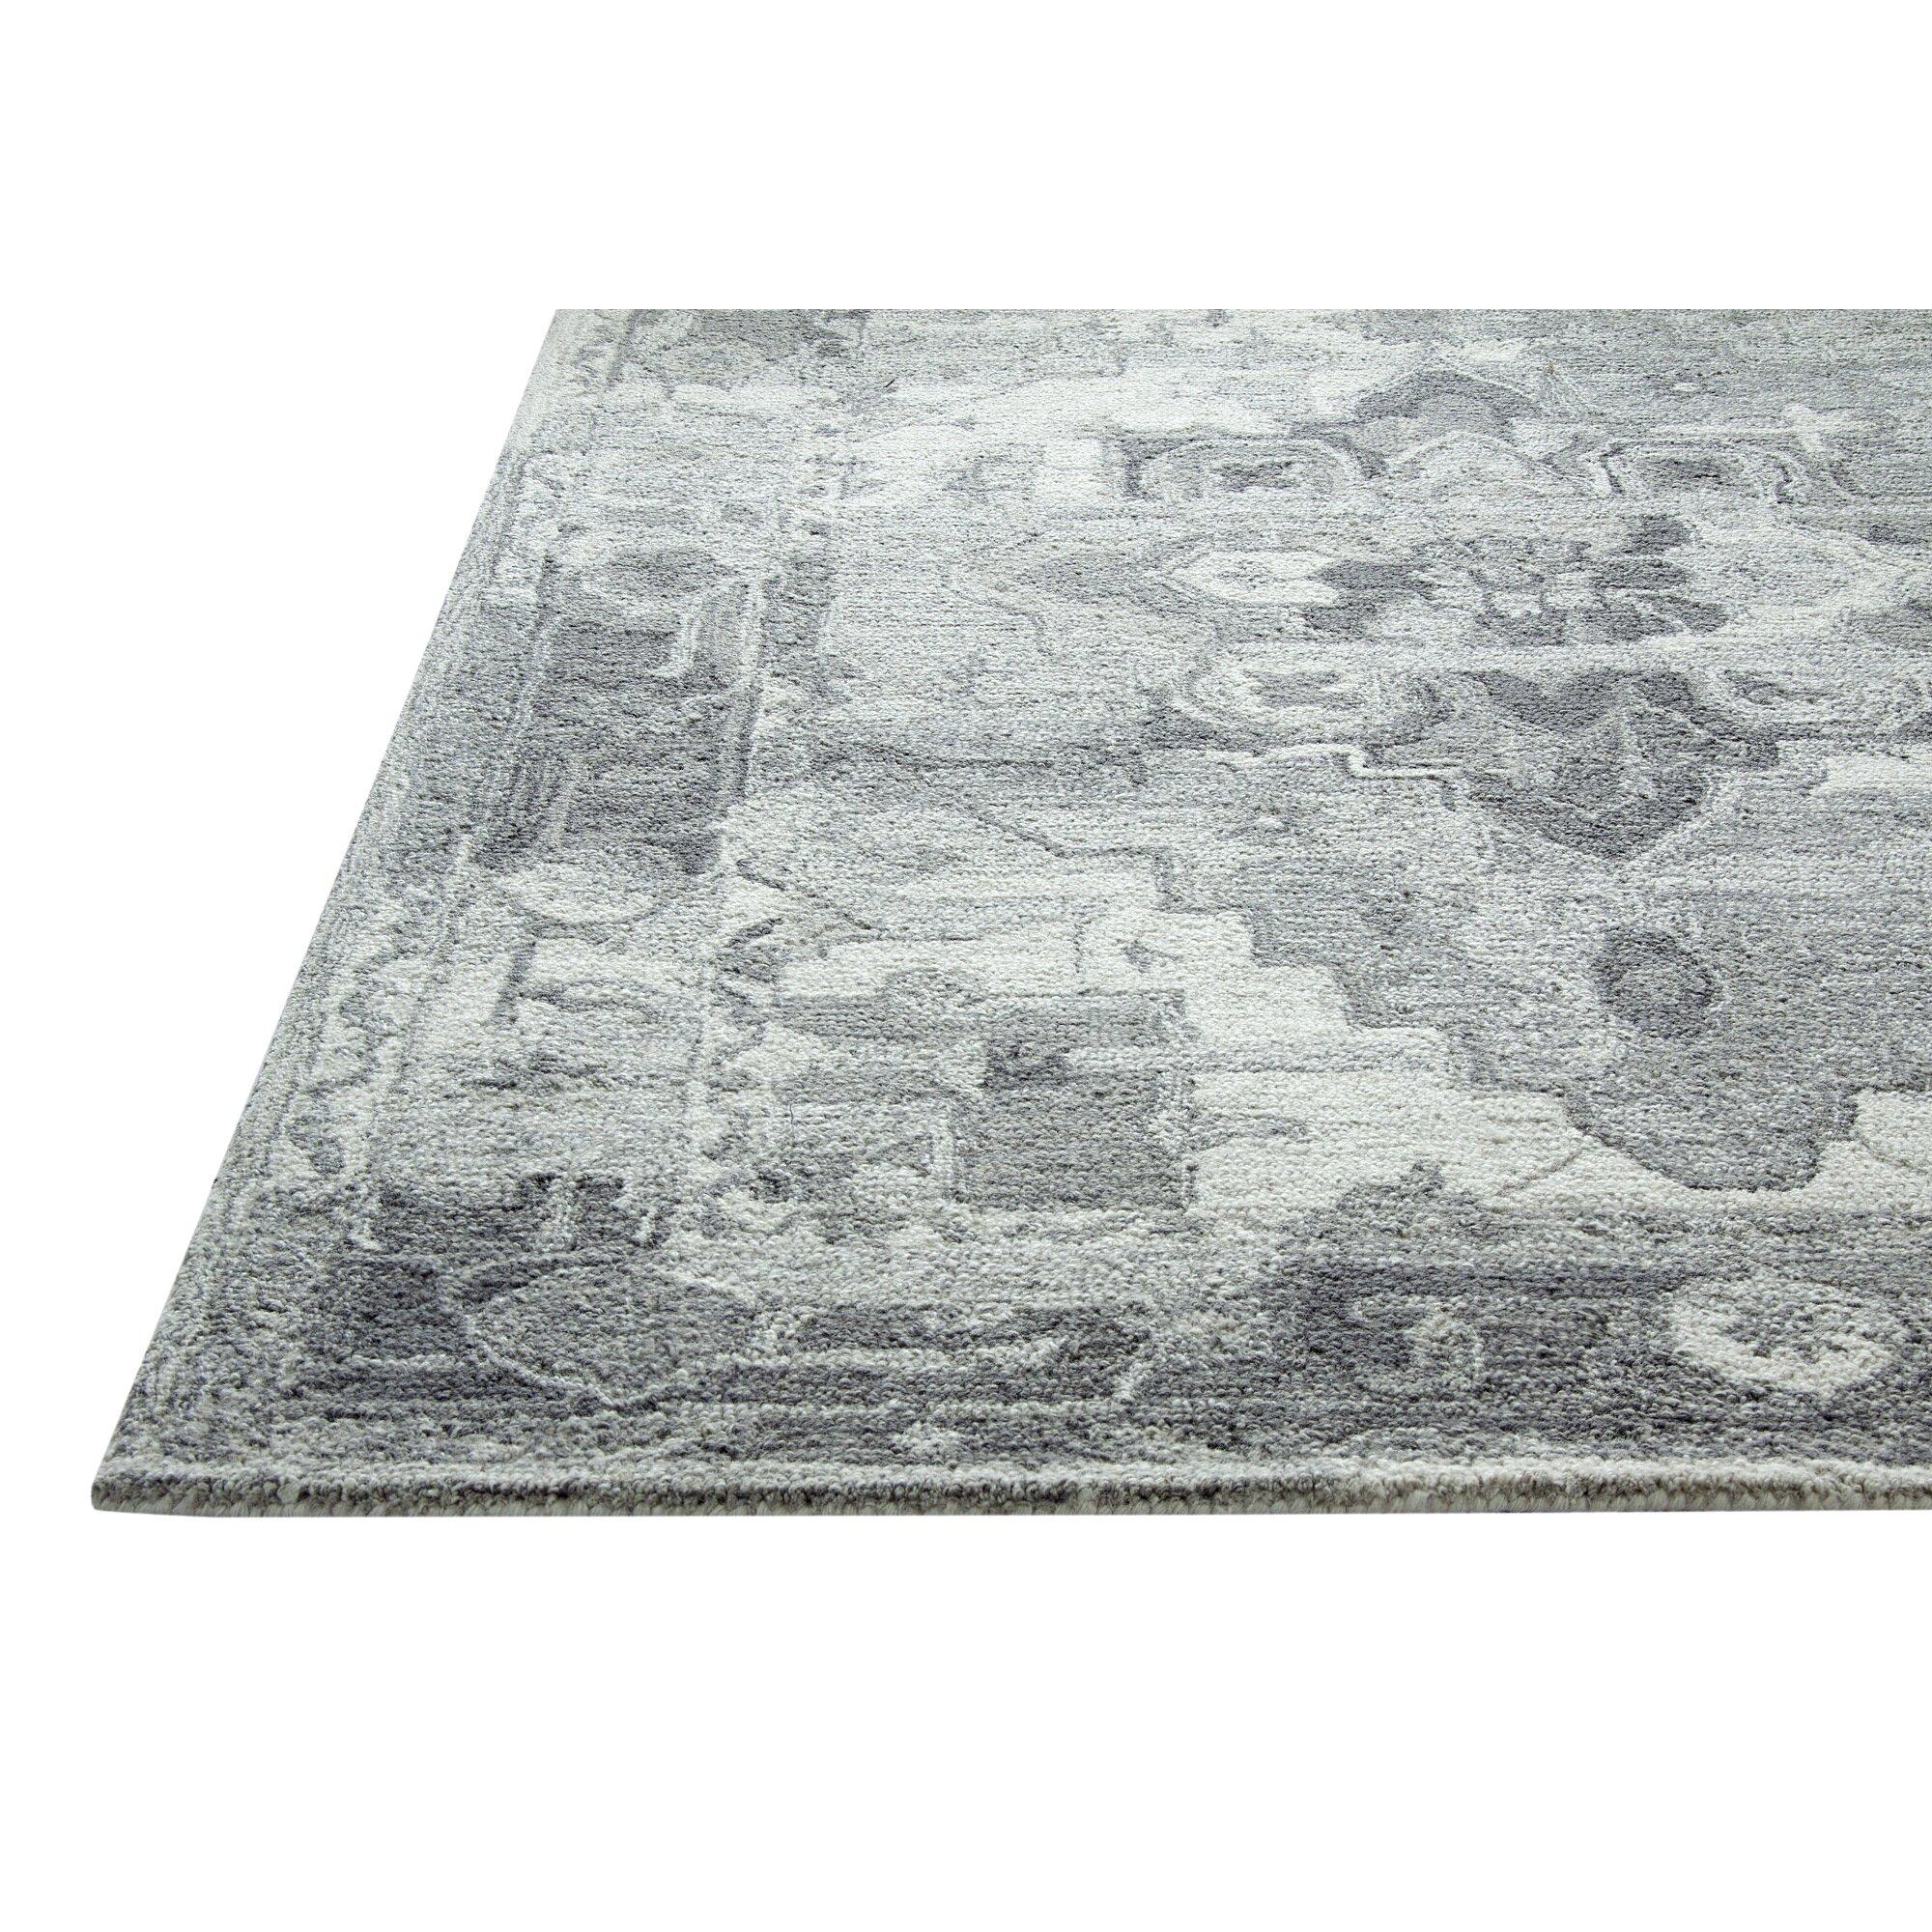 Avalon carpet and tile area rugs carpet vidalondon flooring by shaw avalon gray area rug baanklon Choice Image